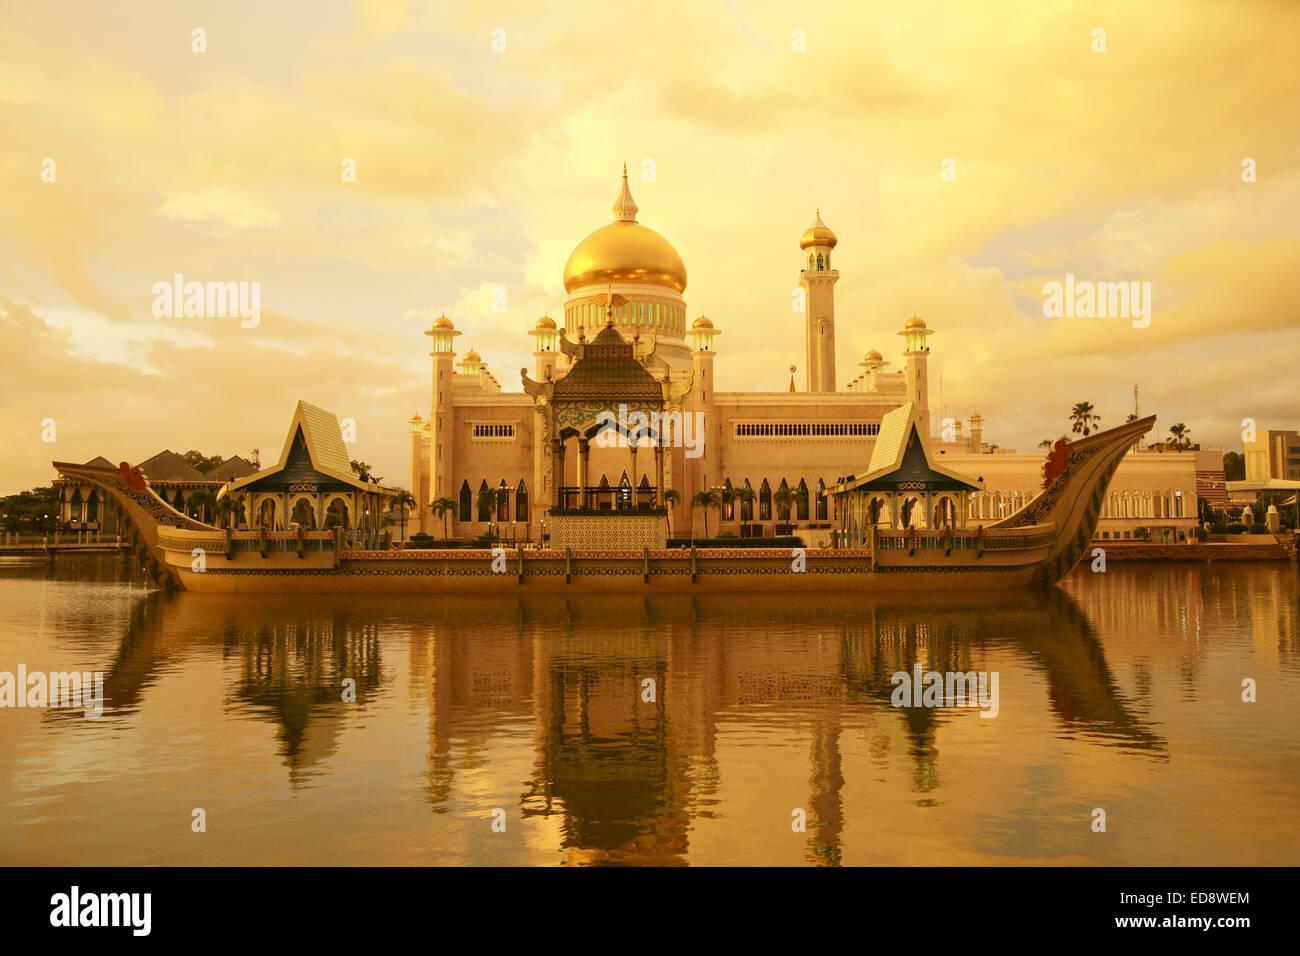 Sunset on the Sultan Omar Ali Saifuddien Mosque, an Islamic mosque located in Bandar Seri Begawan, Brunei. - Stock Image